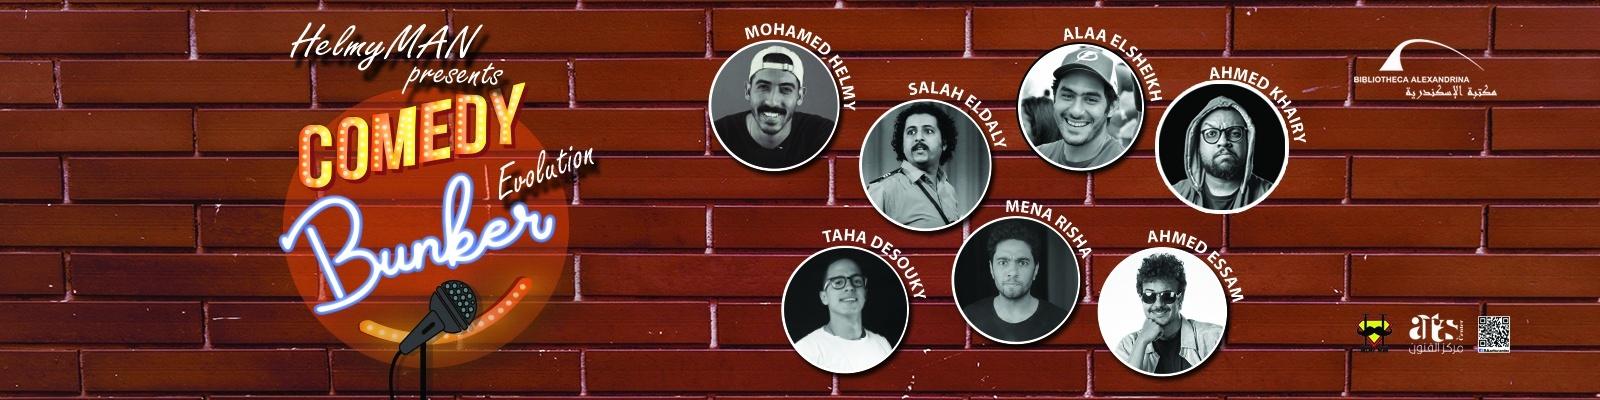 Comédie Stand-up: Spectacle de Mohamed Helmi